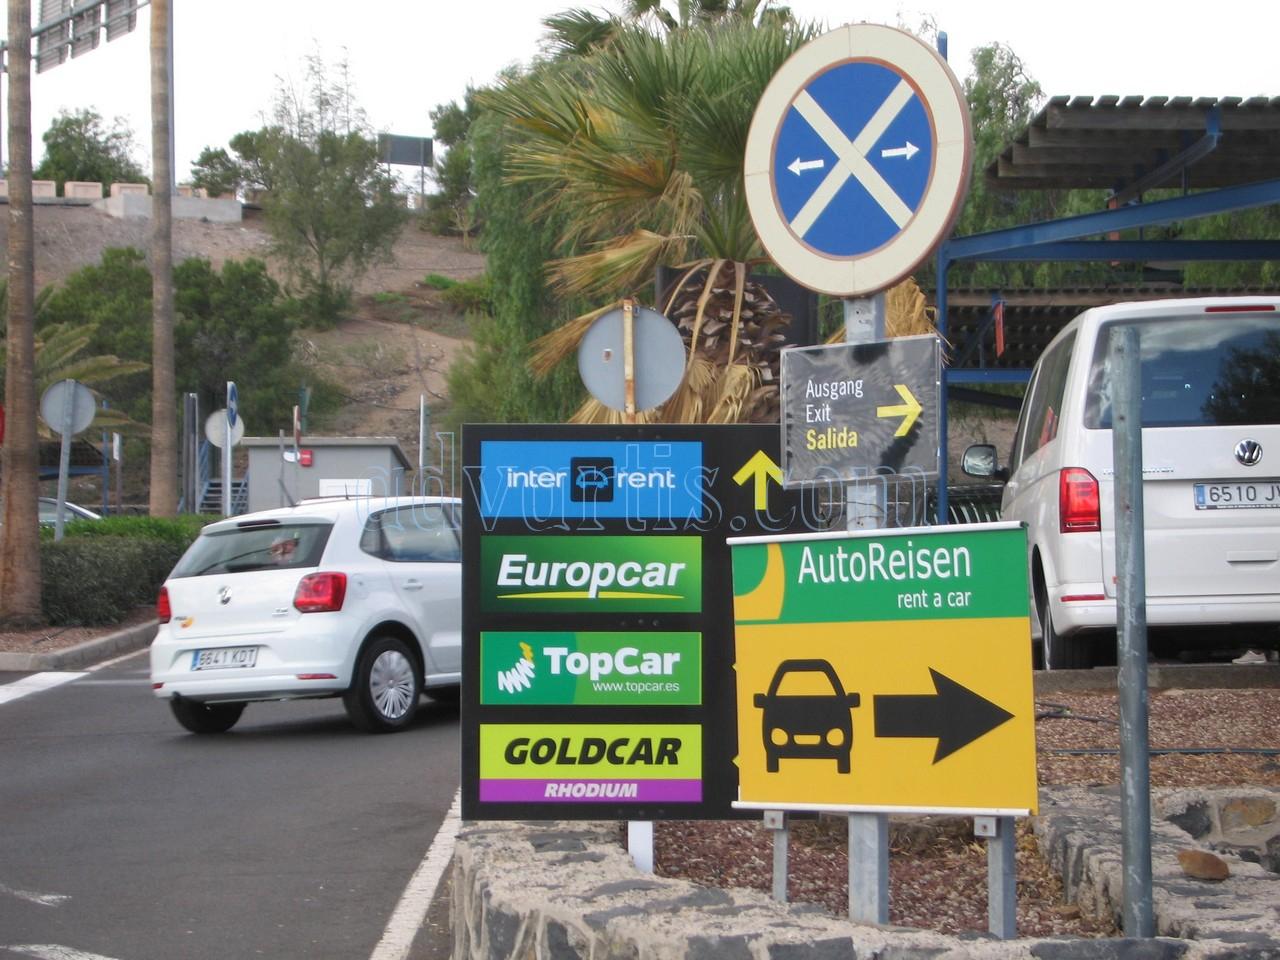 Car hire Tenerife airport south